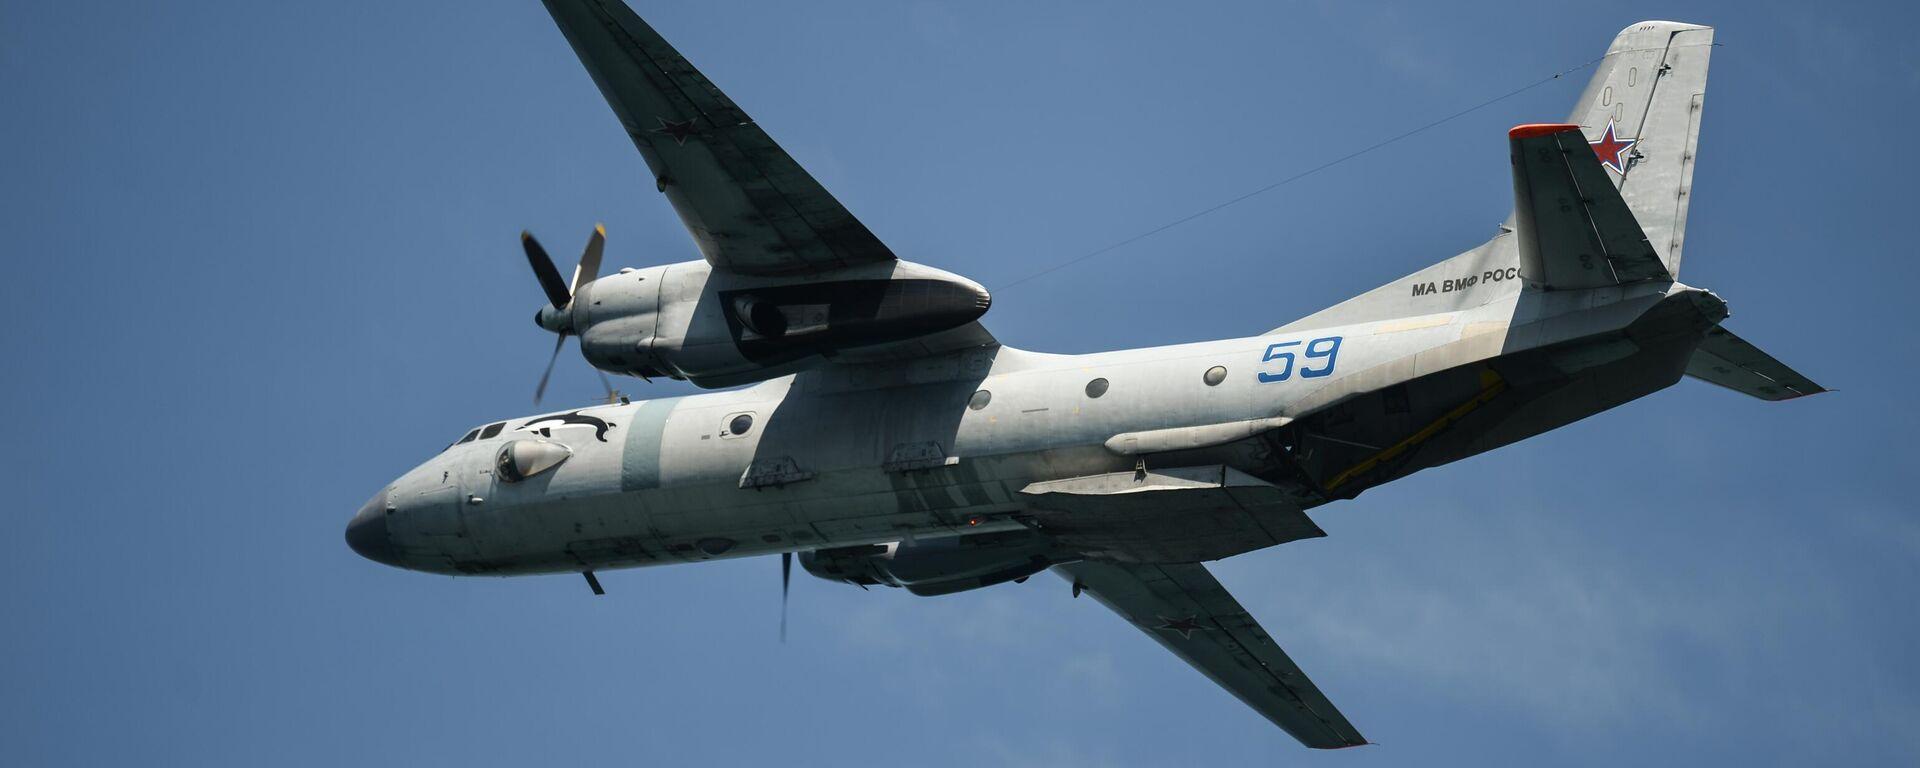 Военно-транспортный самолёт Ан-26 - Sputnik Таджикистан, 1920, 06.07.2021